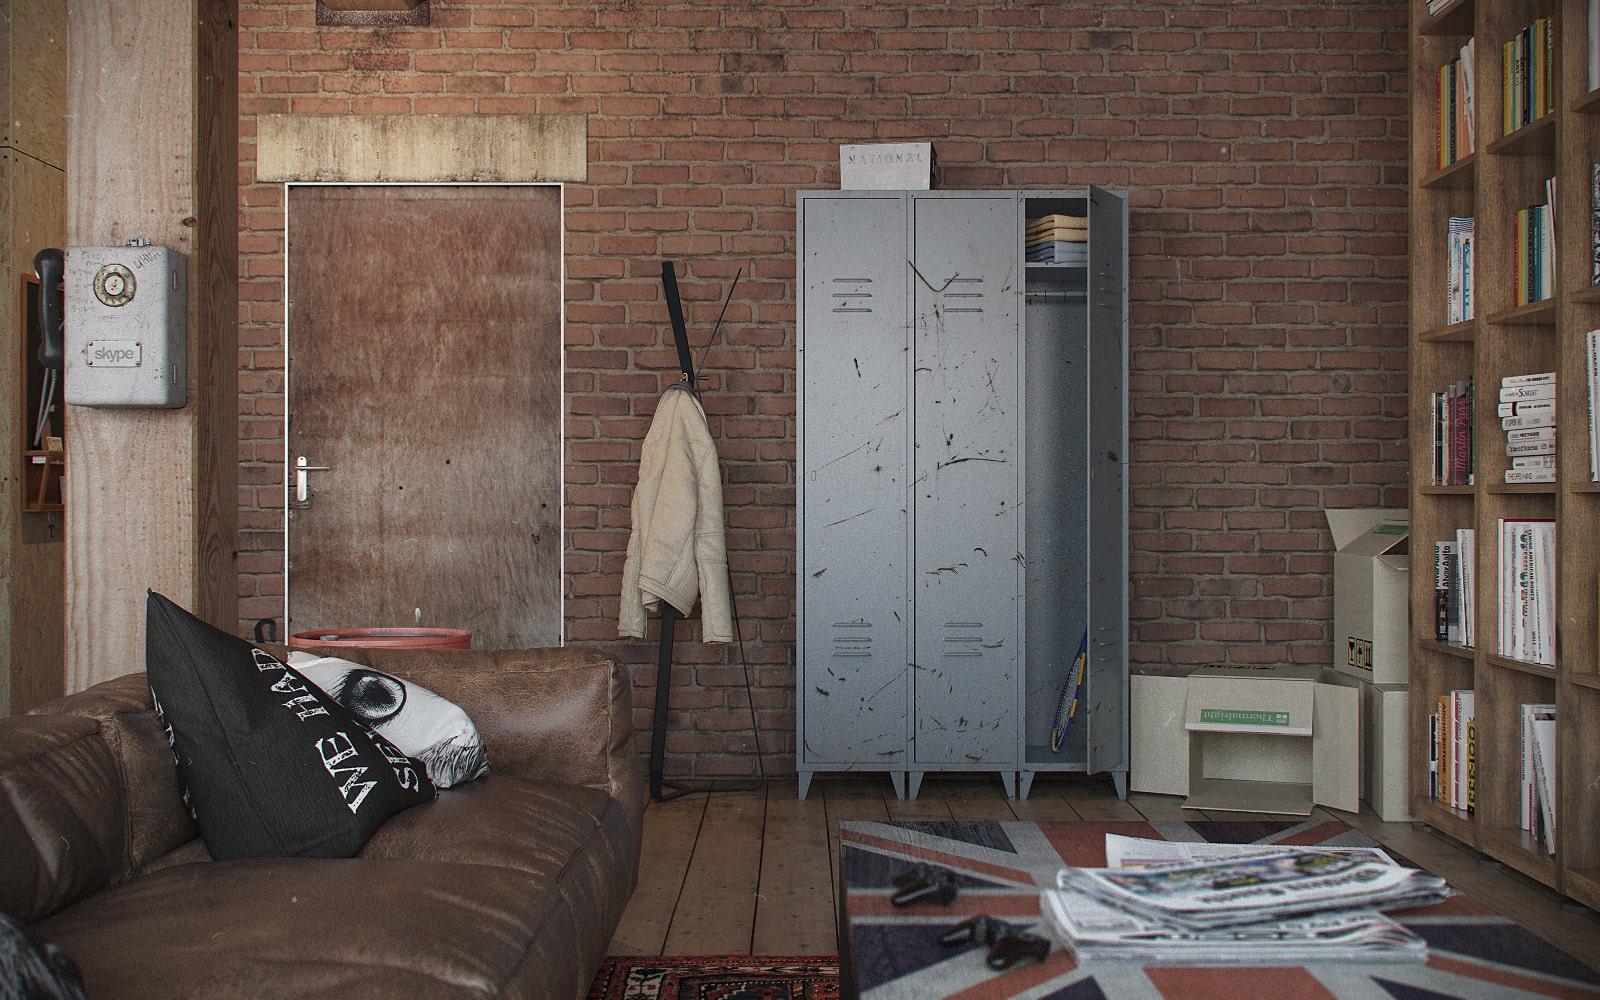 http://design-homes.ru/images/galery/781/dizajn-odnokomnatnoj-kvartiry-v-stile-loft16.jpg